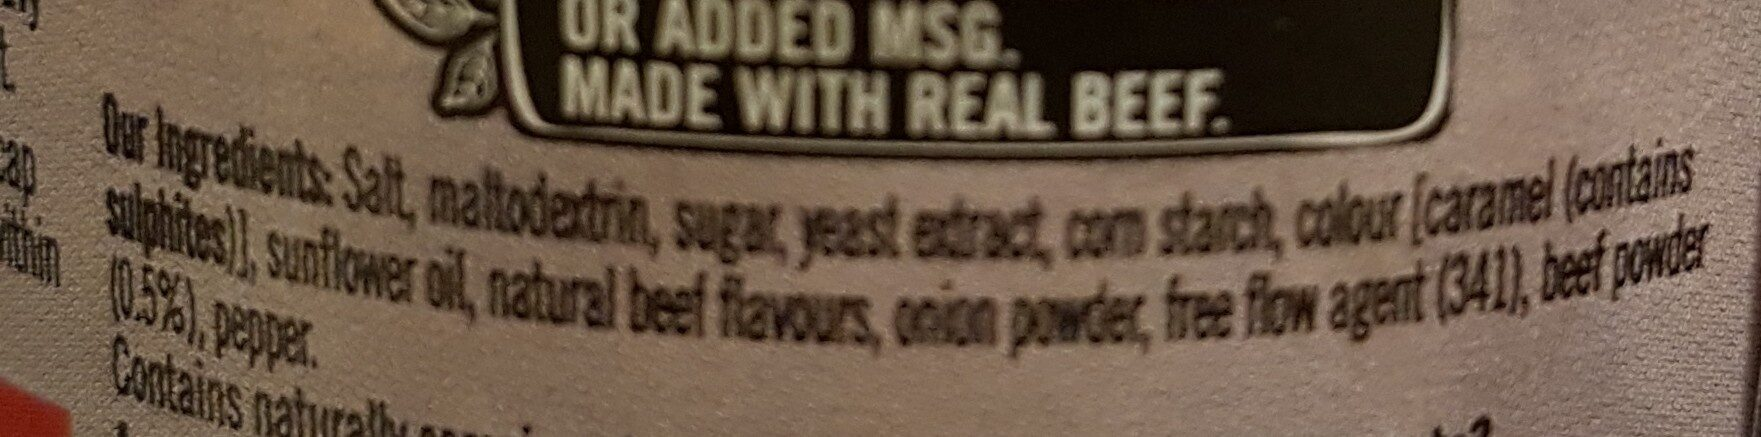 beef stock - Ingredients - en